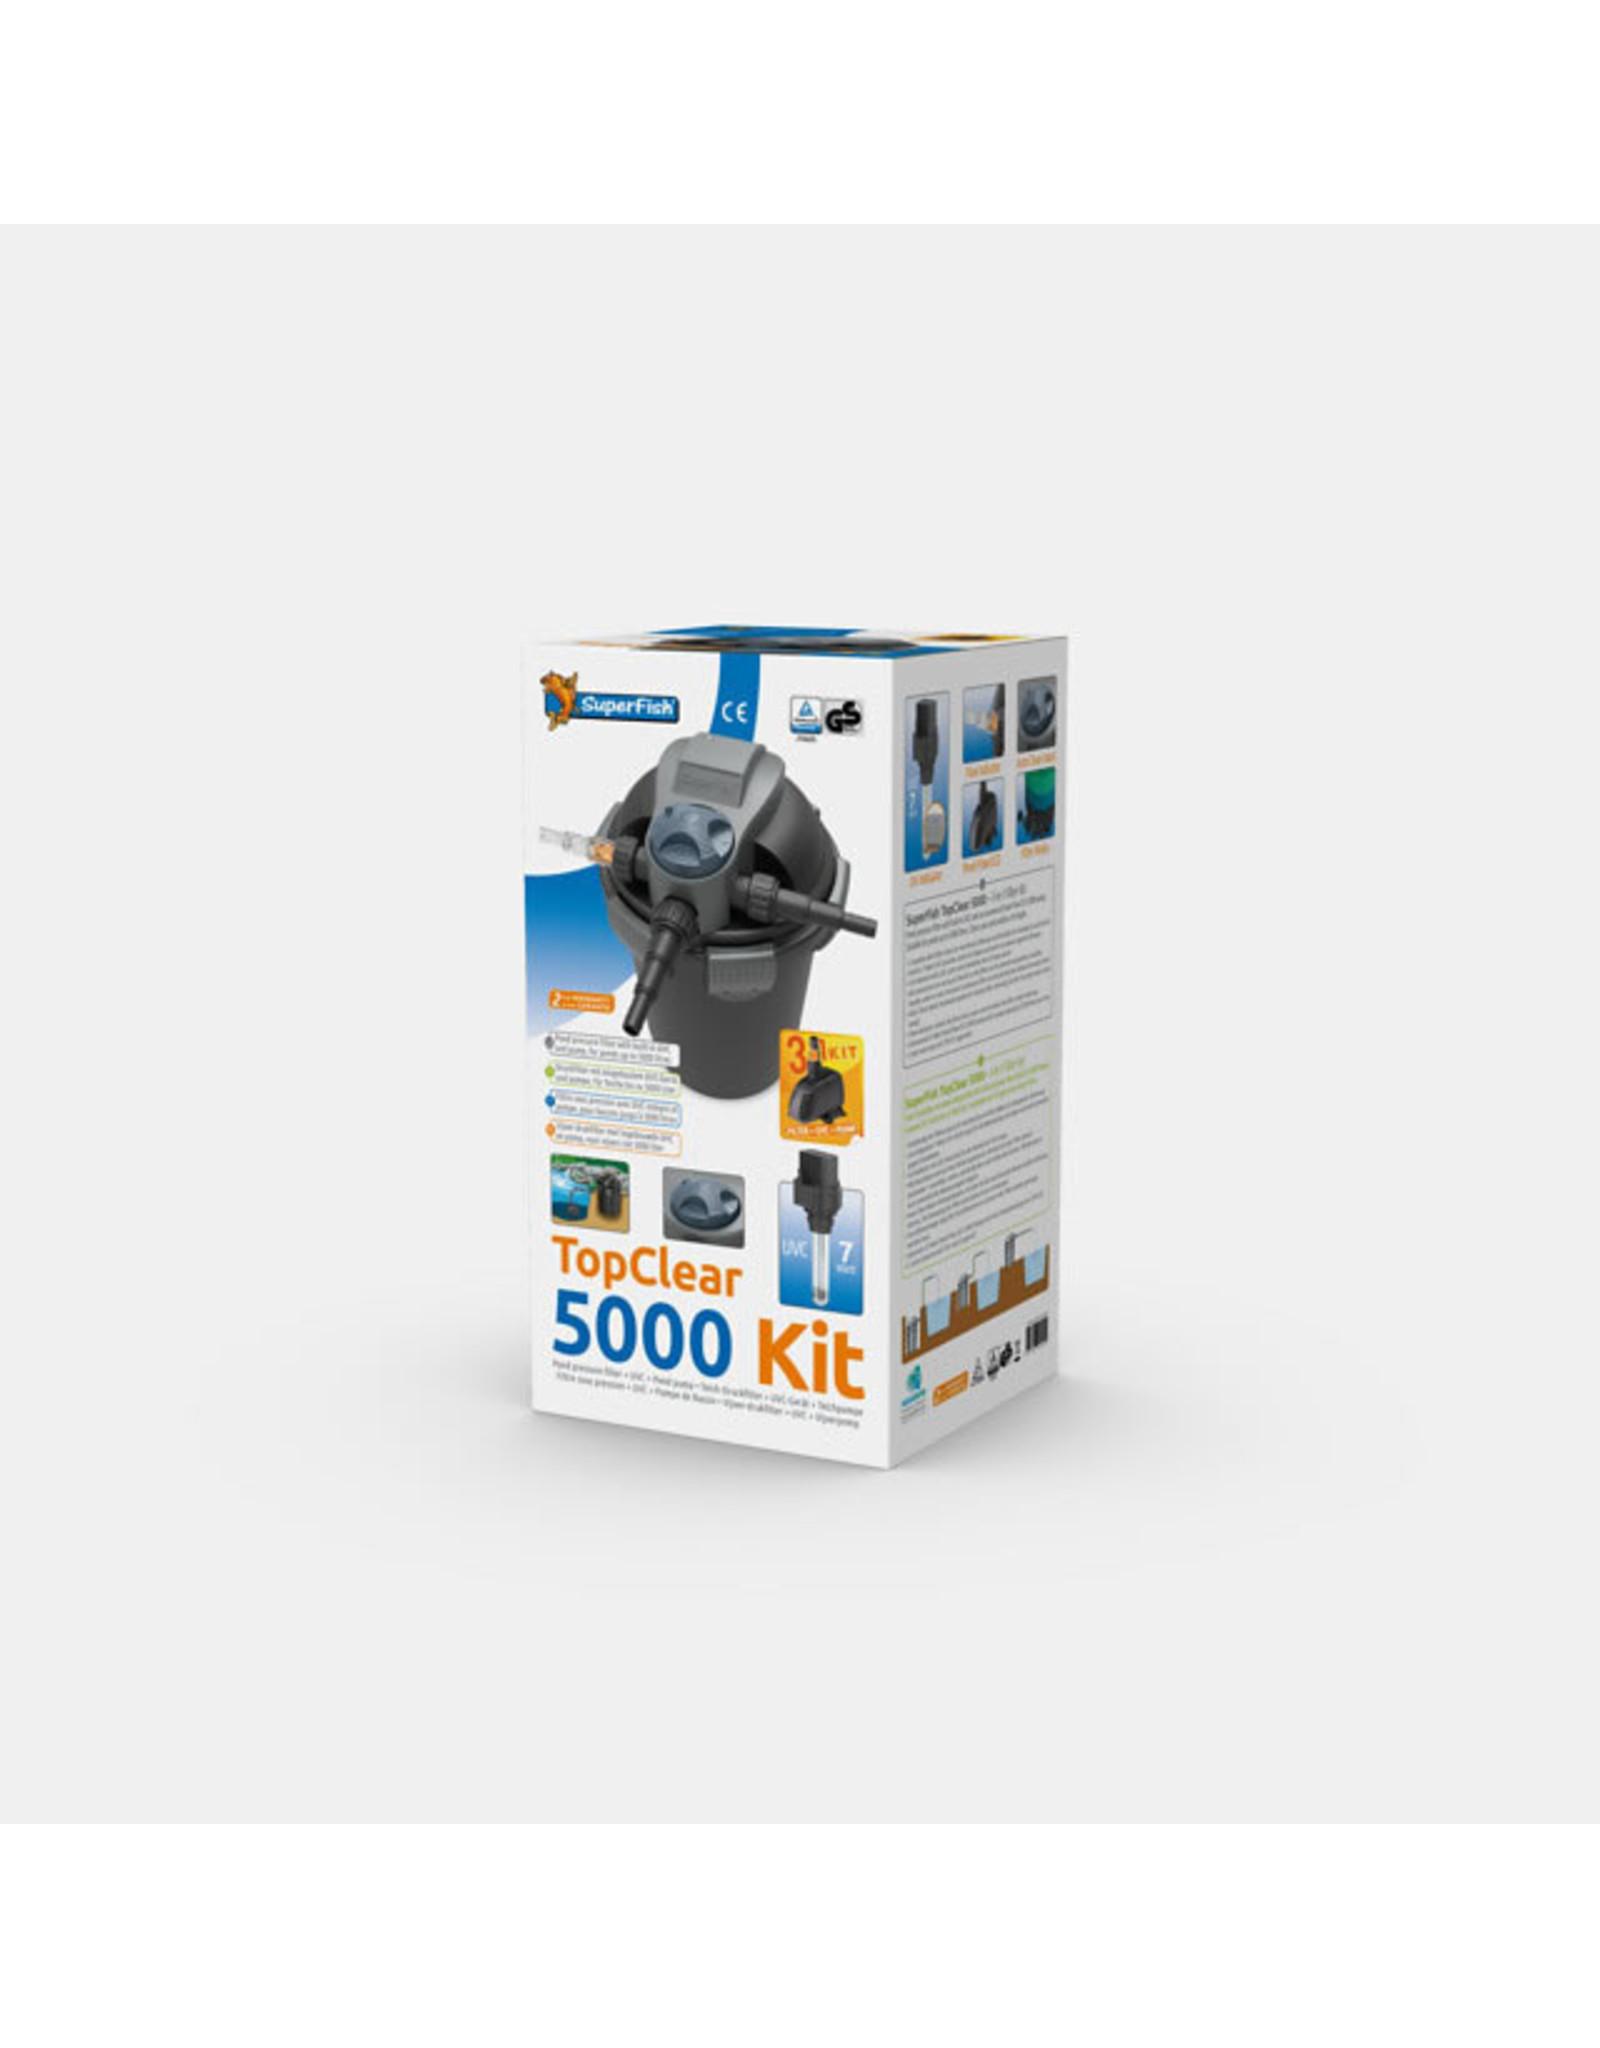 SUPERFISH Superfish TopClear Kit